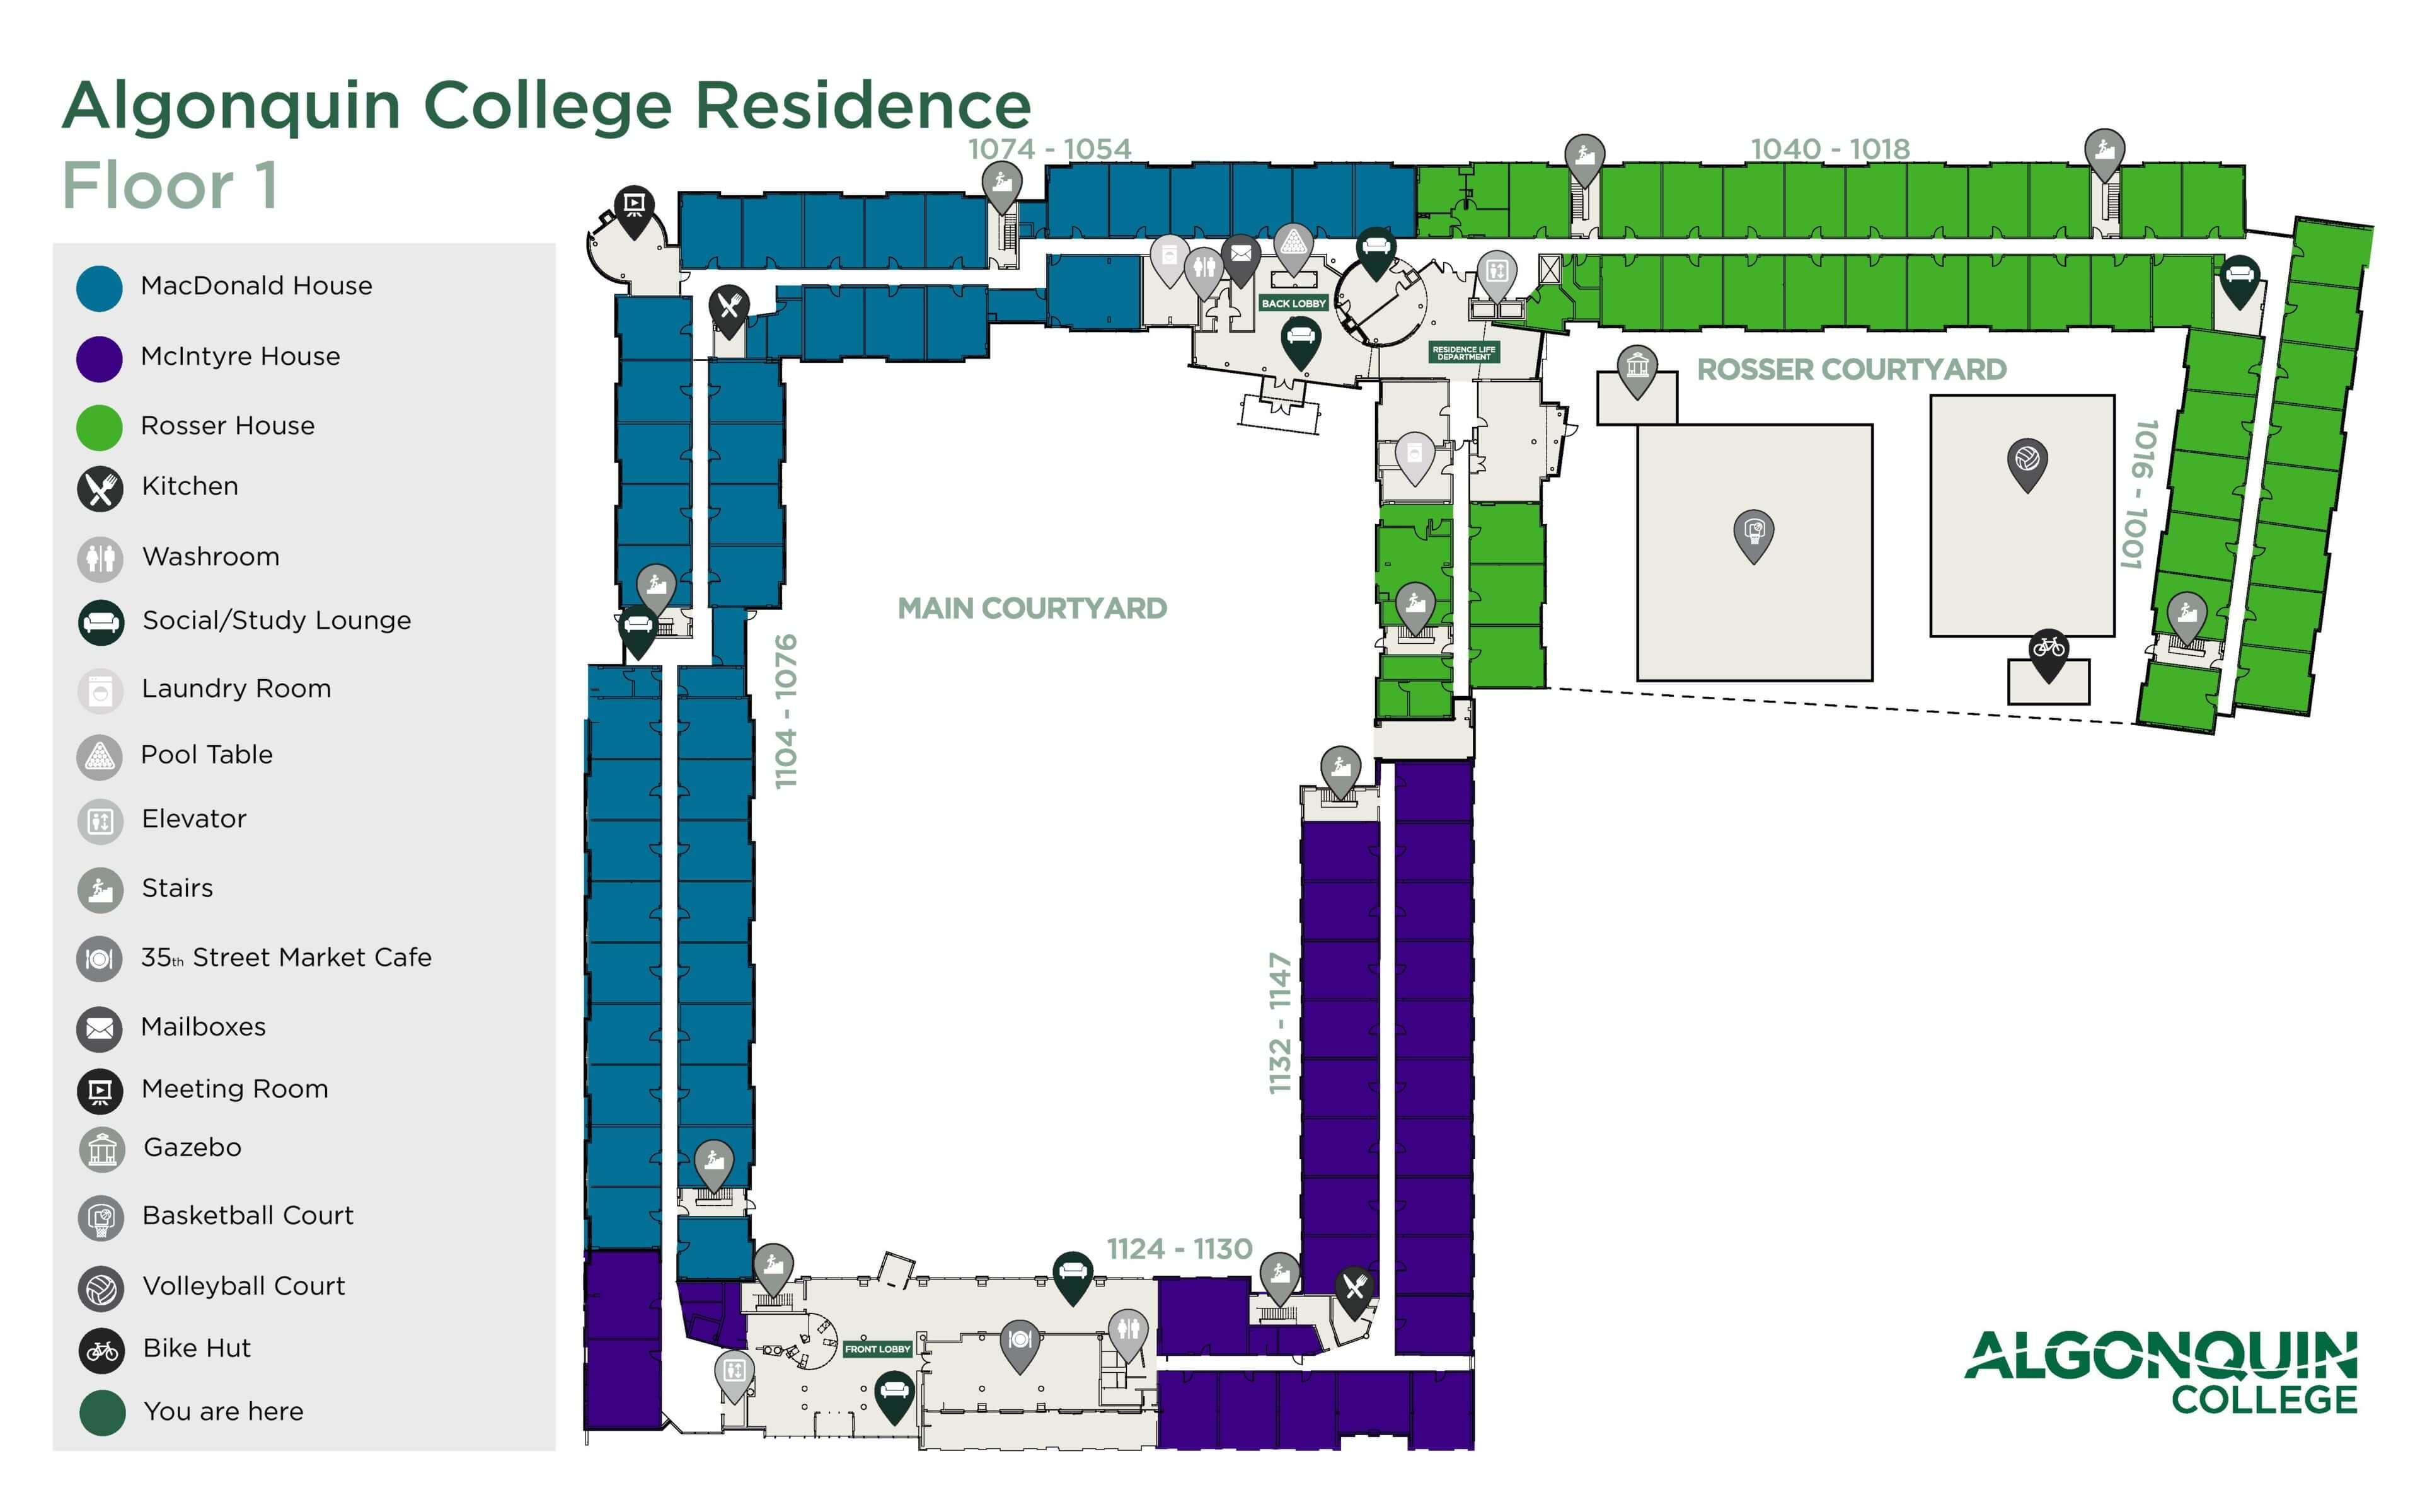 Algonquin College Residence Faq